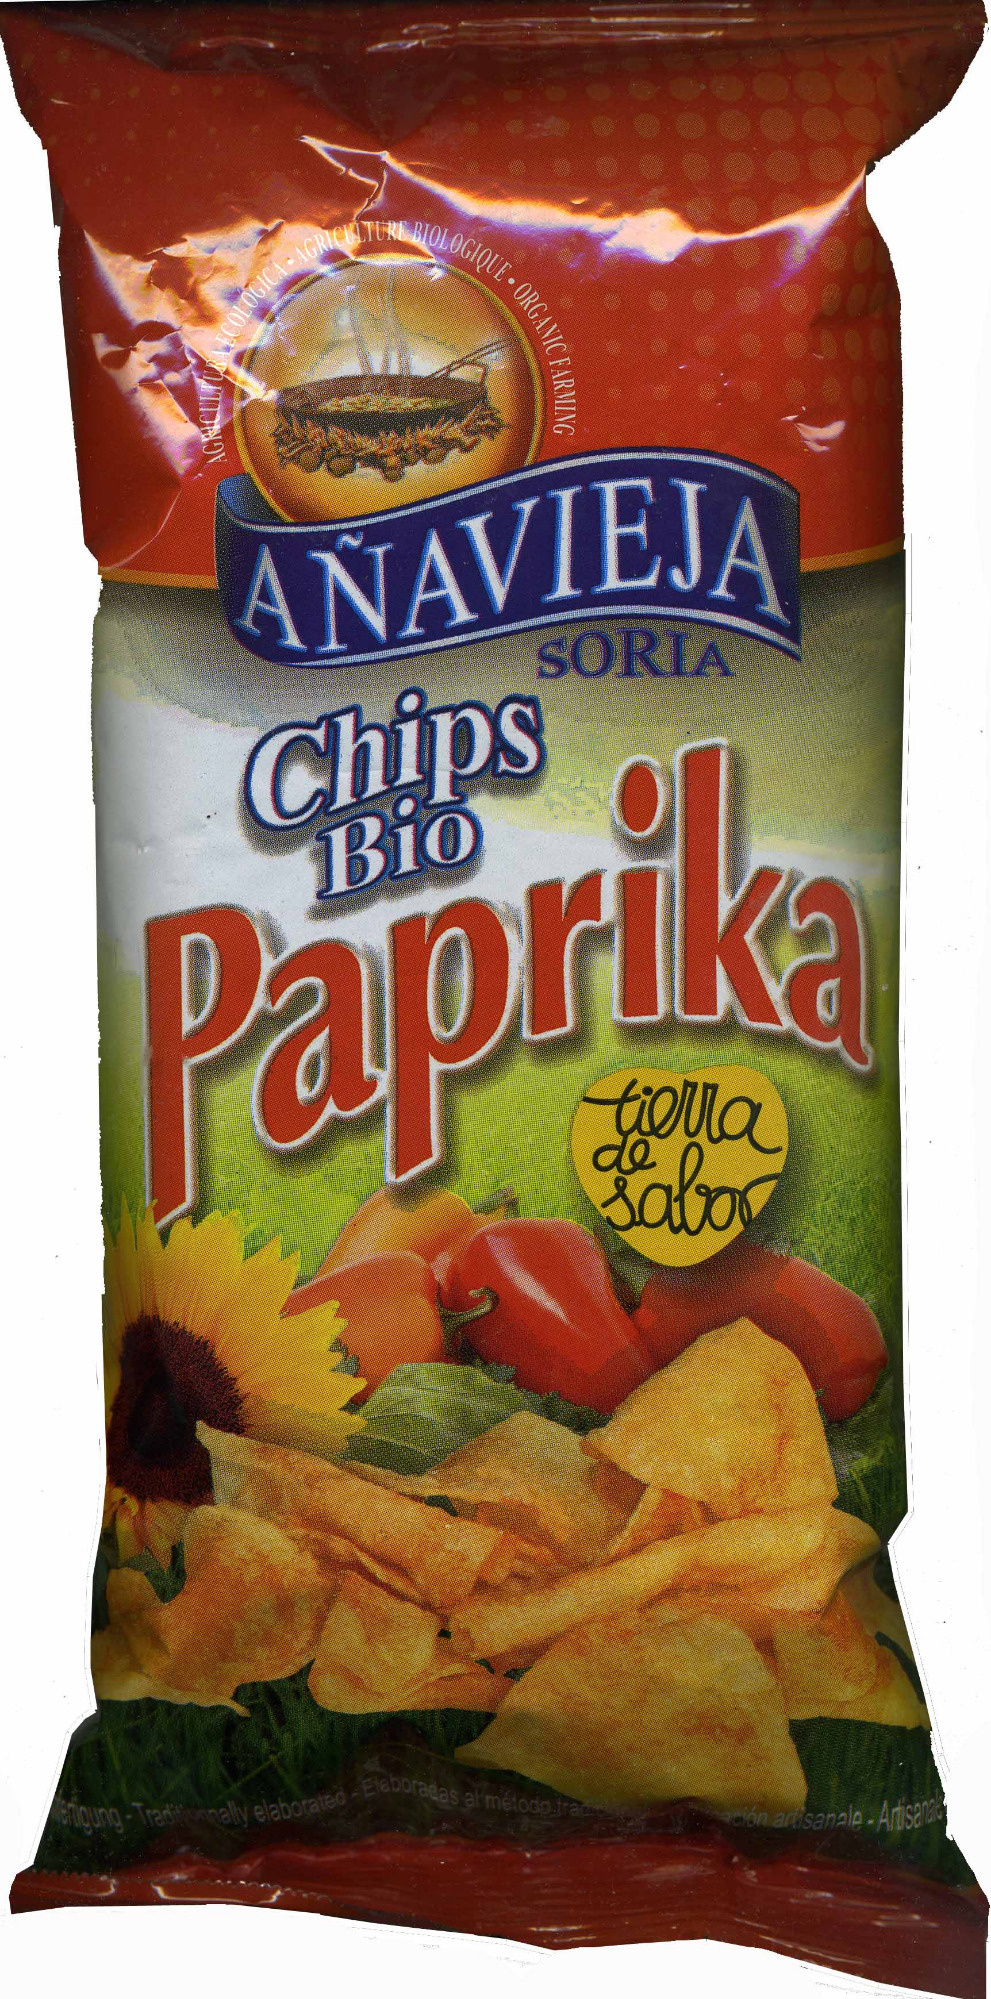 Chips bio paprika - Producto - es